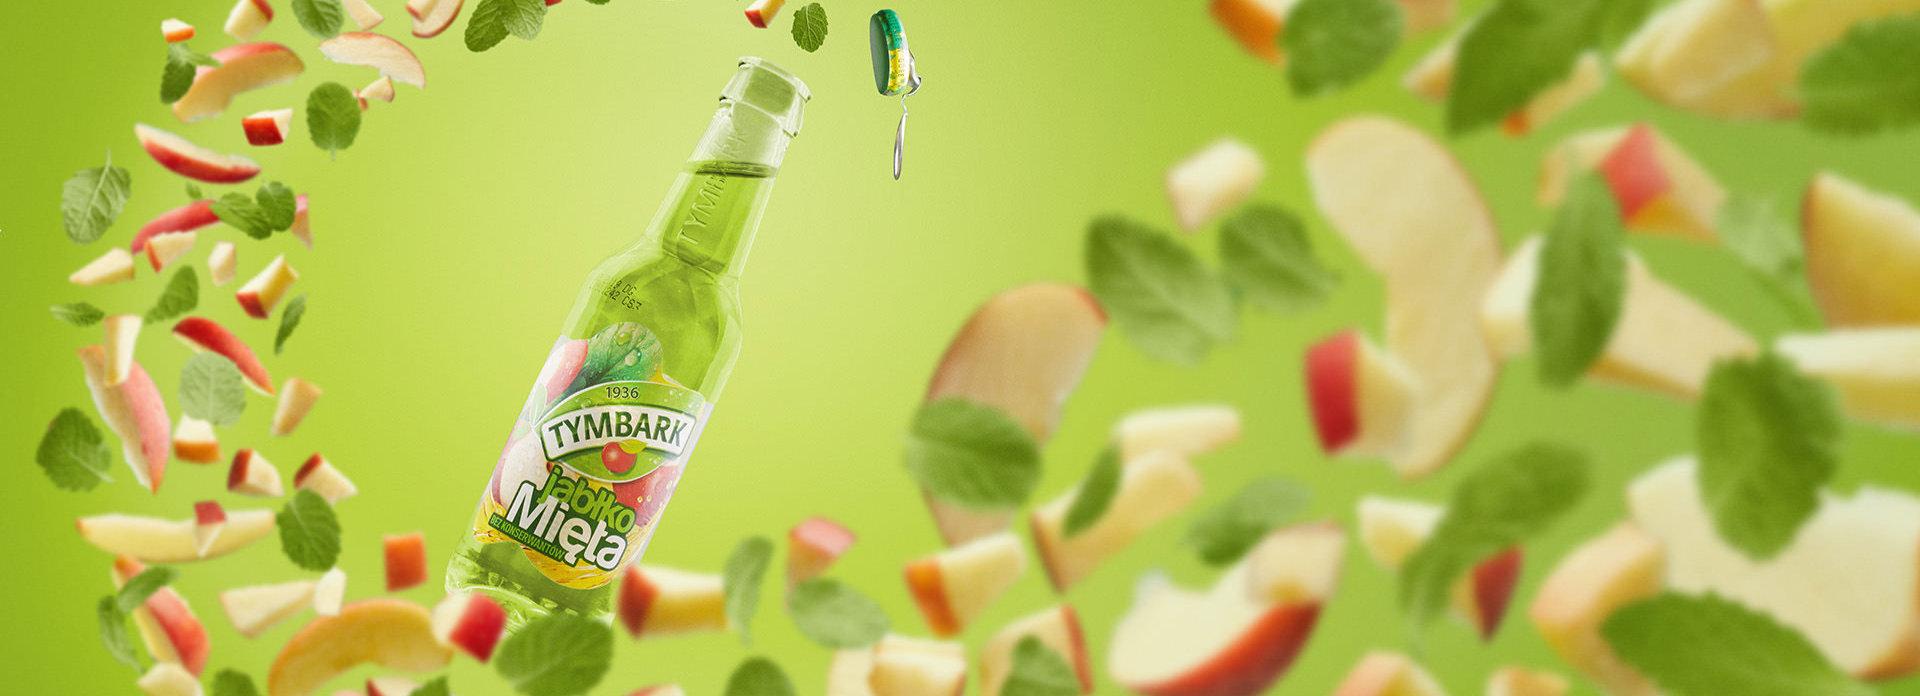 Fotografia reklamowa typu key visual dla marki Tymbark